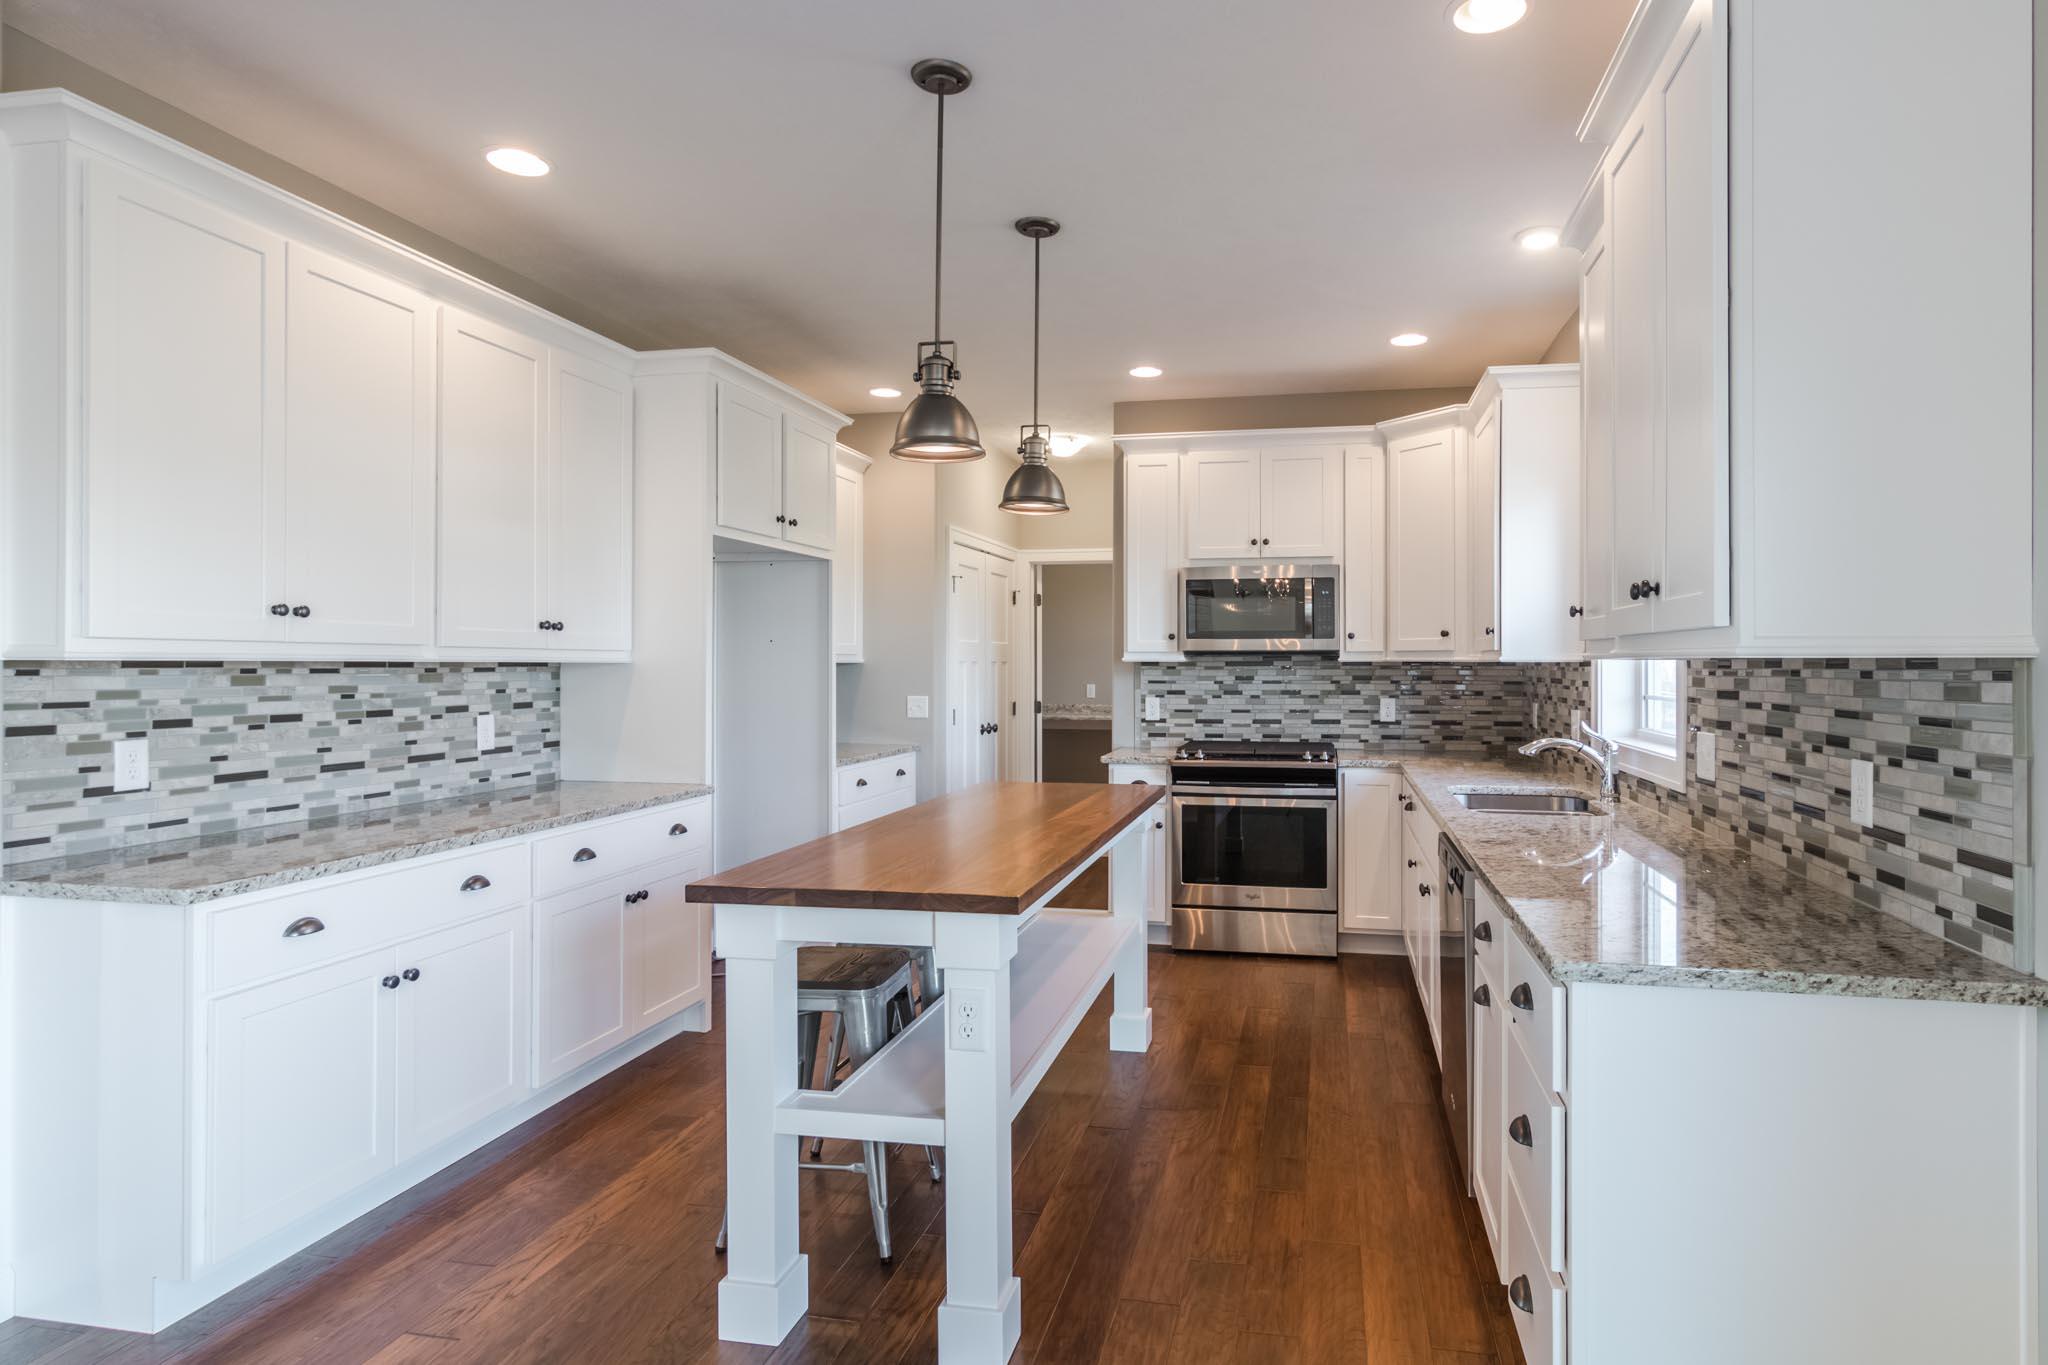 1815 Pfitzer kitchen 2 in Normal IL home for sale